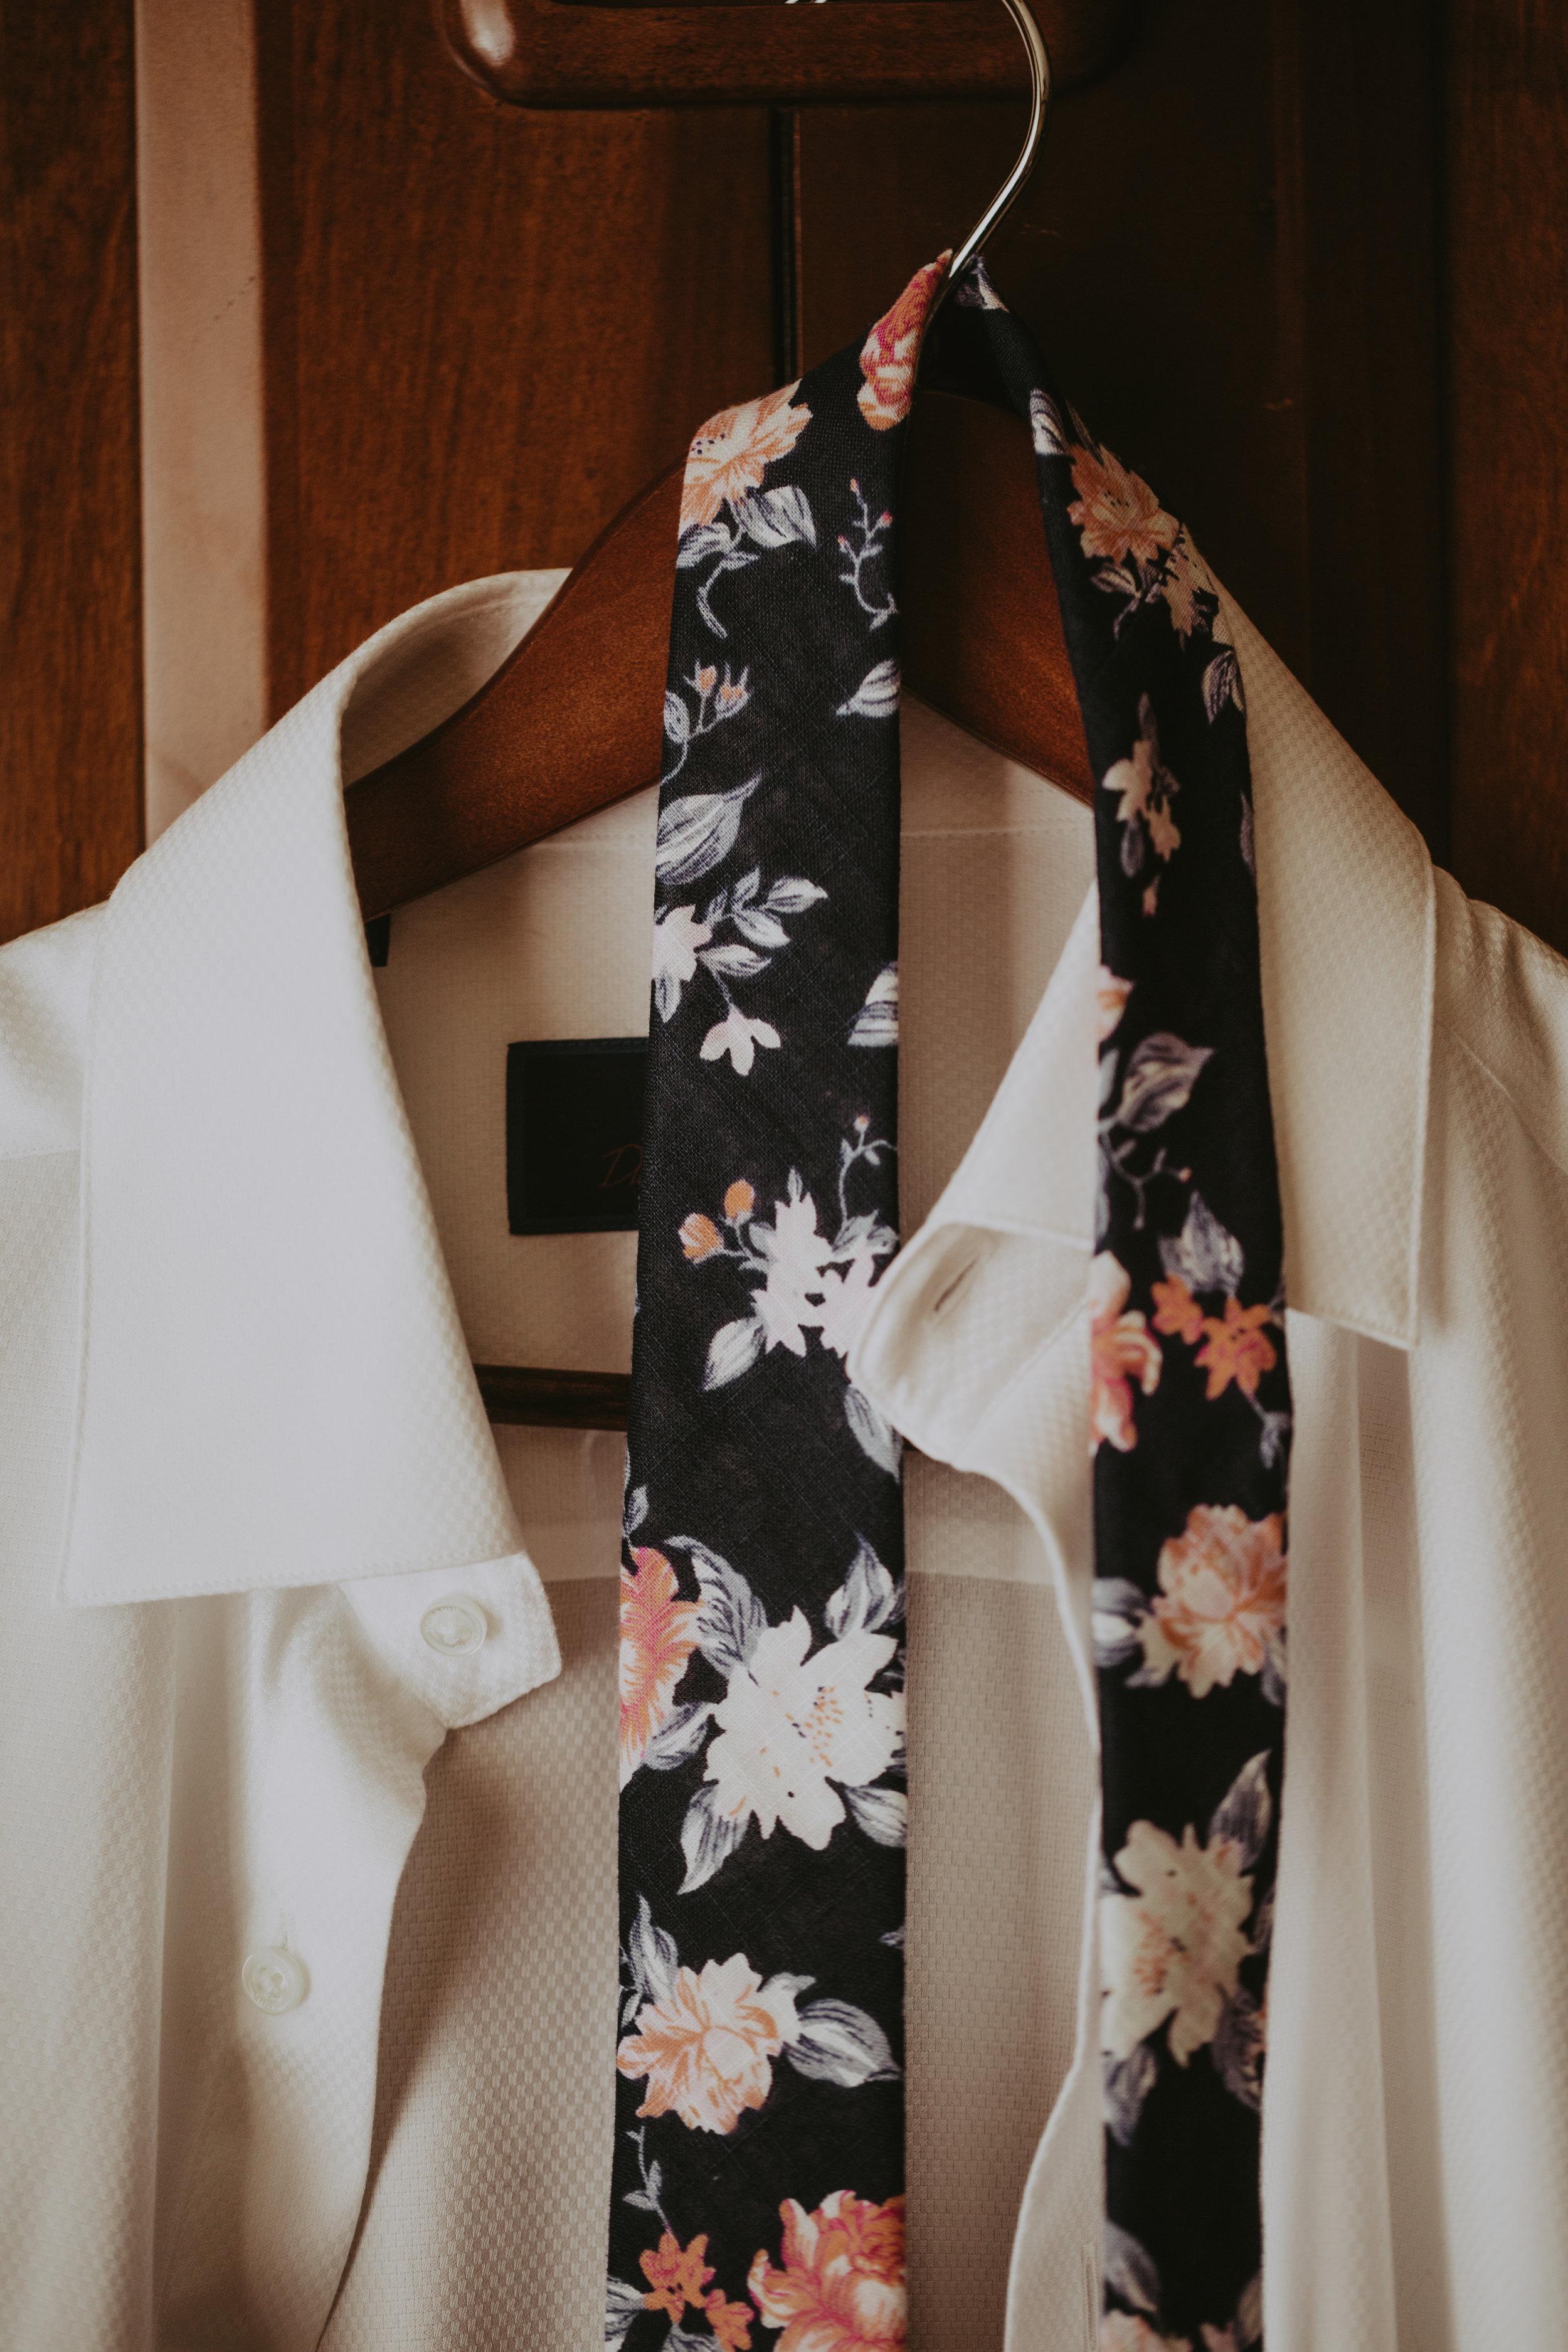 VILLA DEL PALMAR CANCUN WEDDING-THY-BRAN-JENNY CHOK PHOTOIMG_0041.jpg